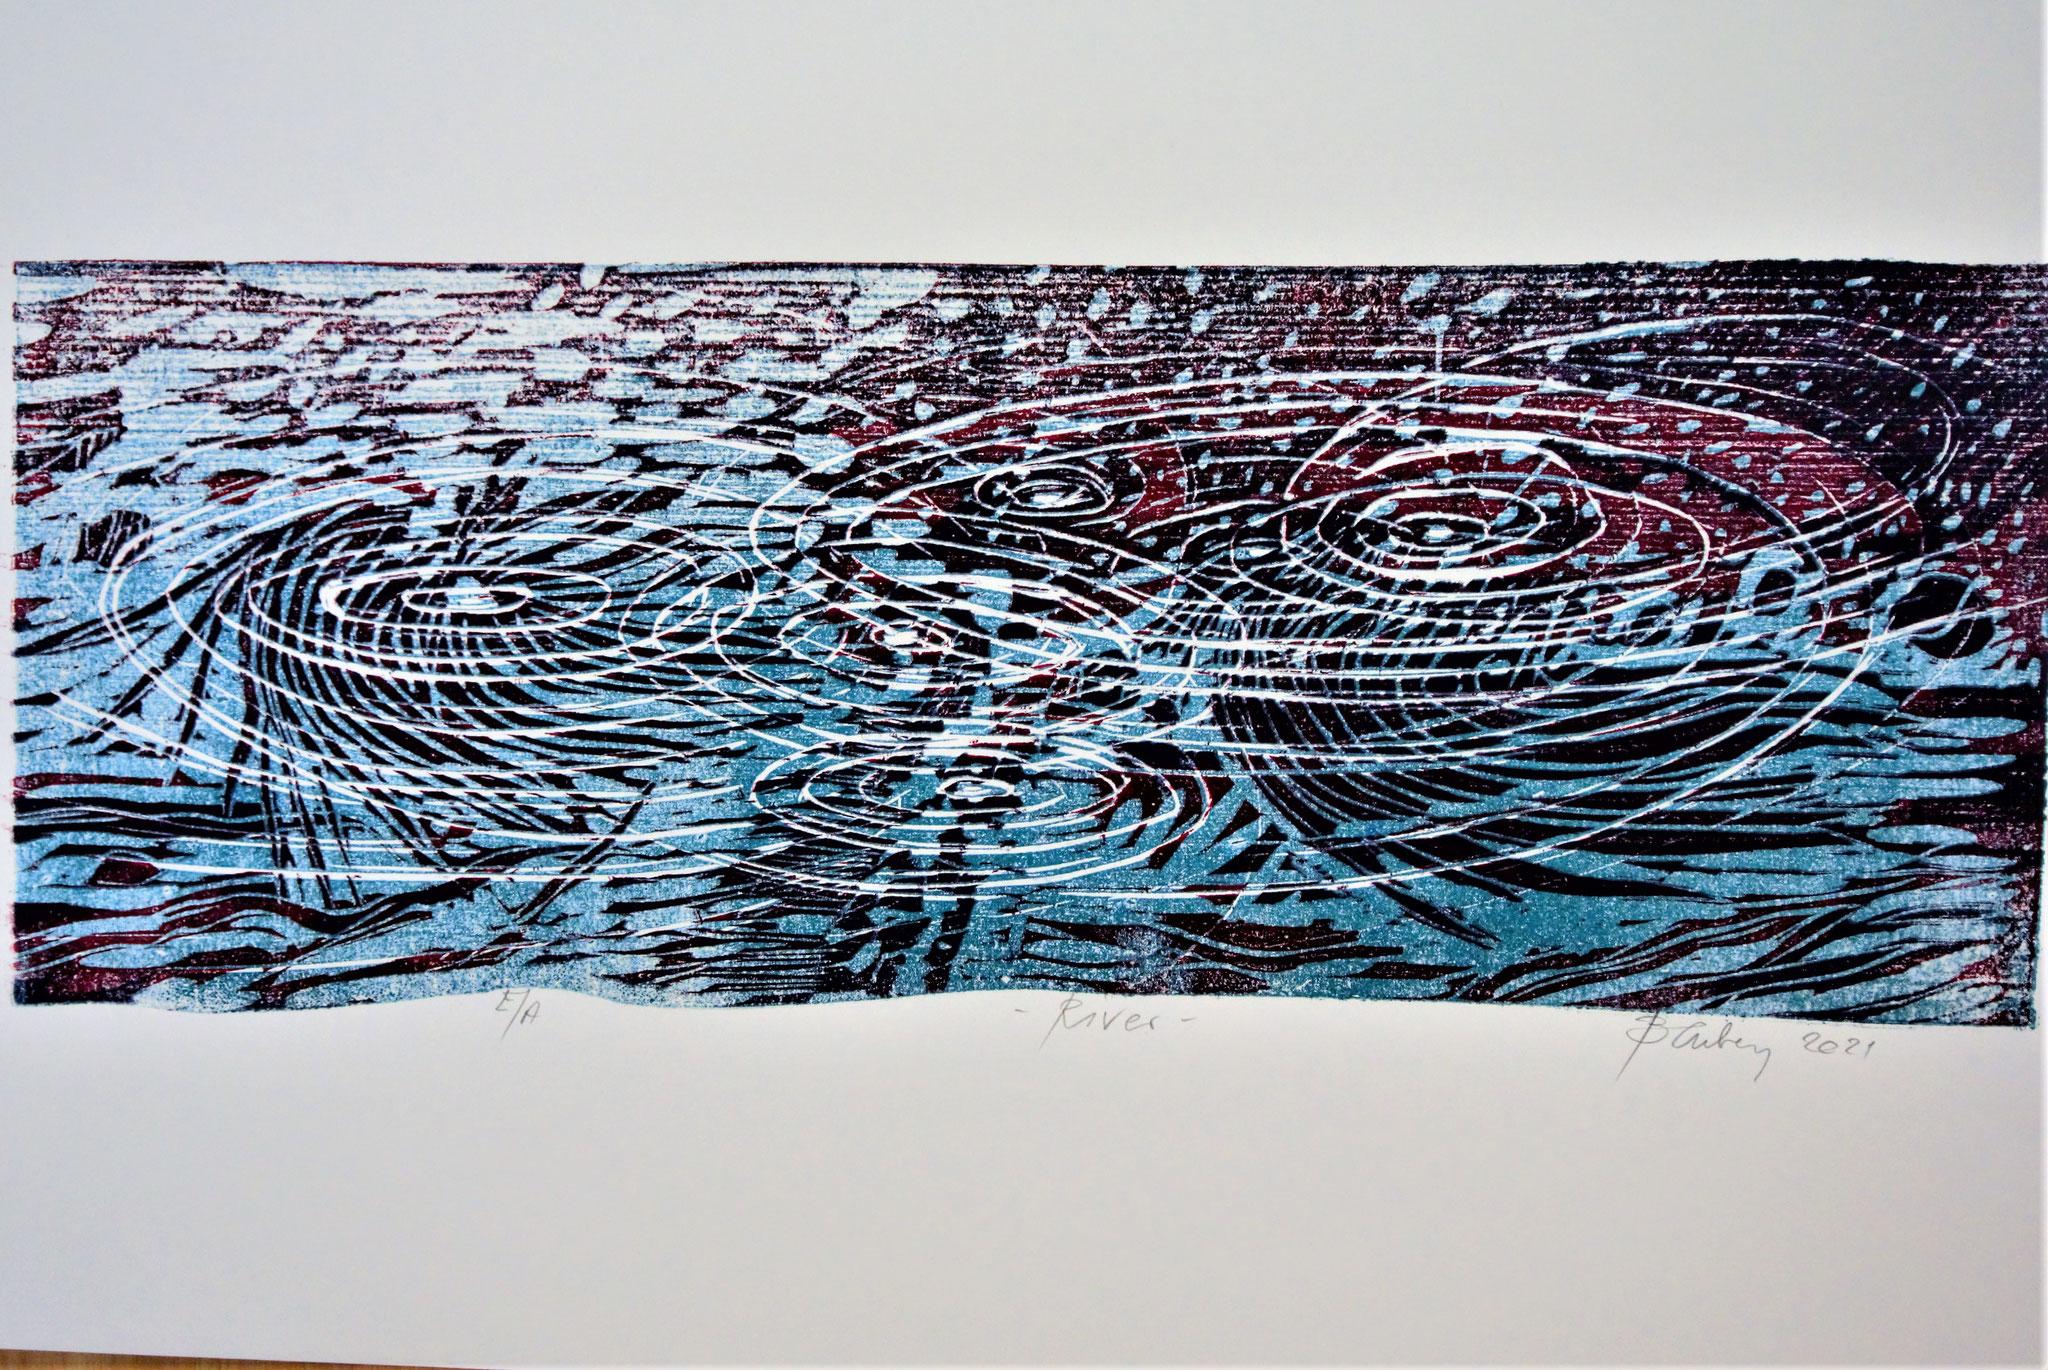 """Rain"" Holzschnitt ca. 60x25cm (verlorene Platte)"